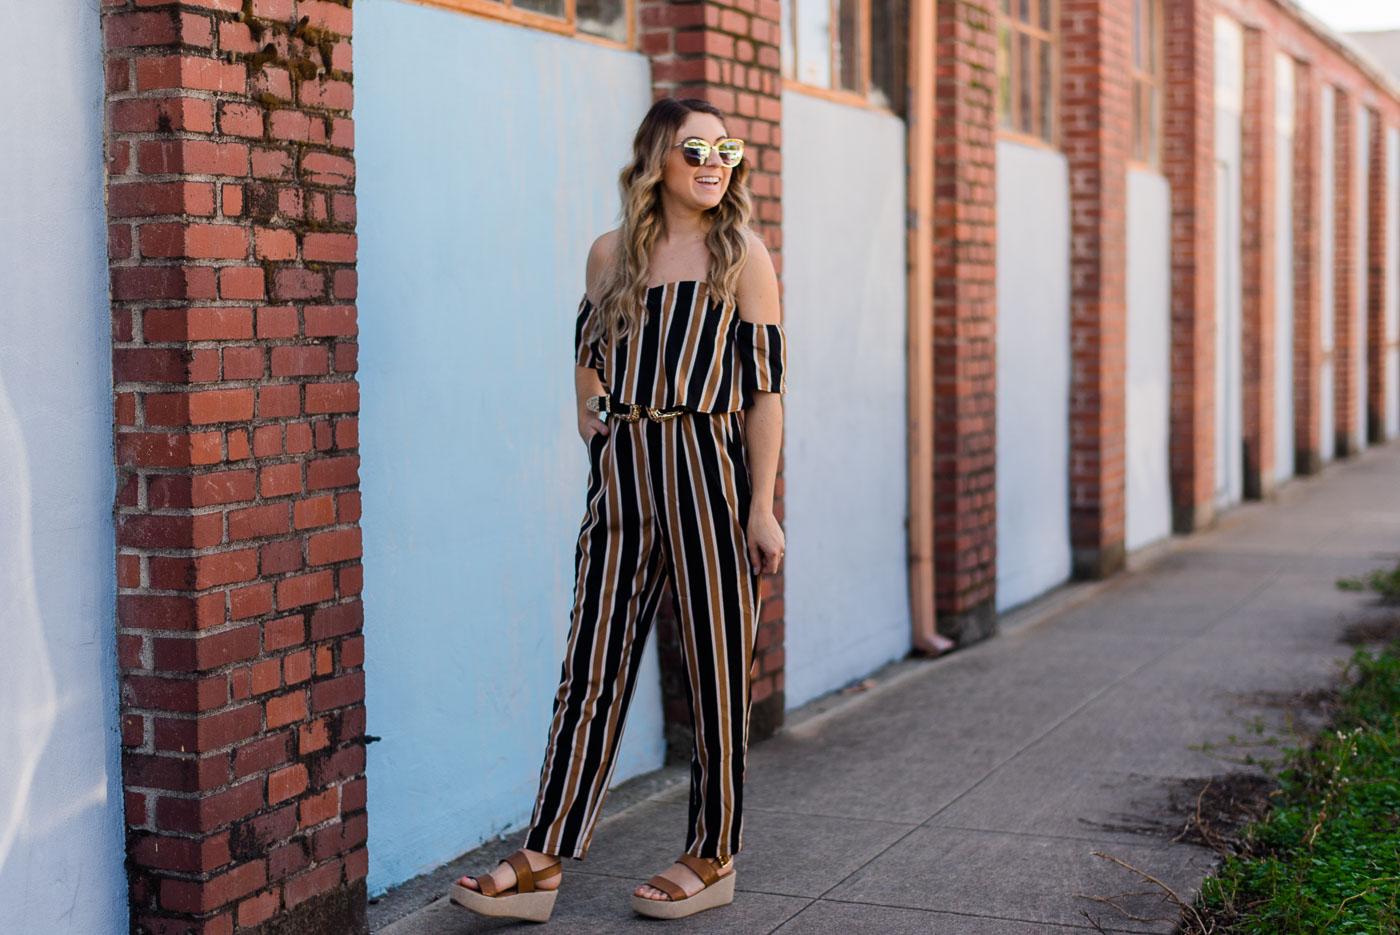 fashion blogger-1.jpg